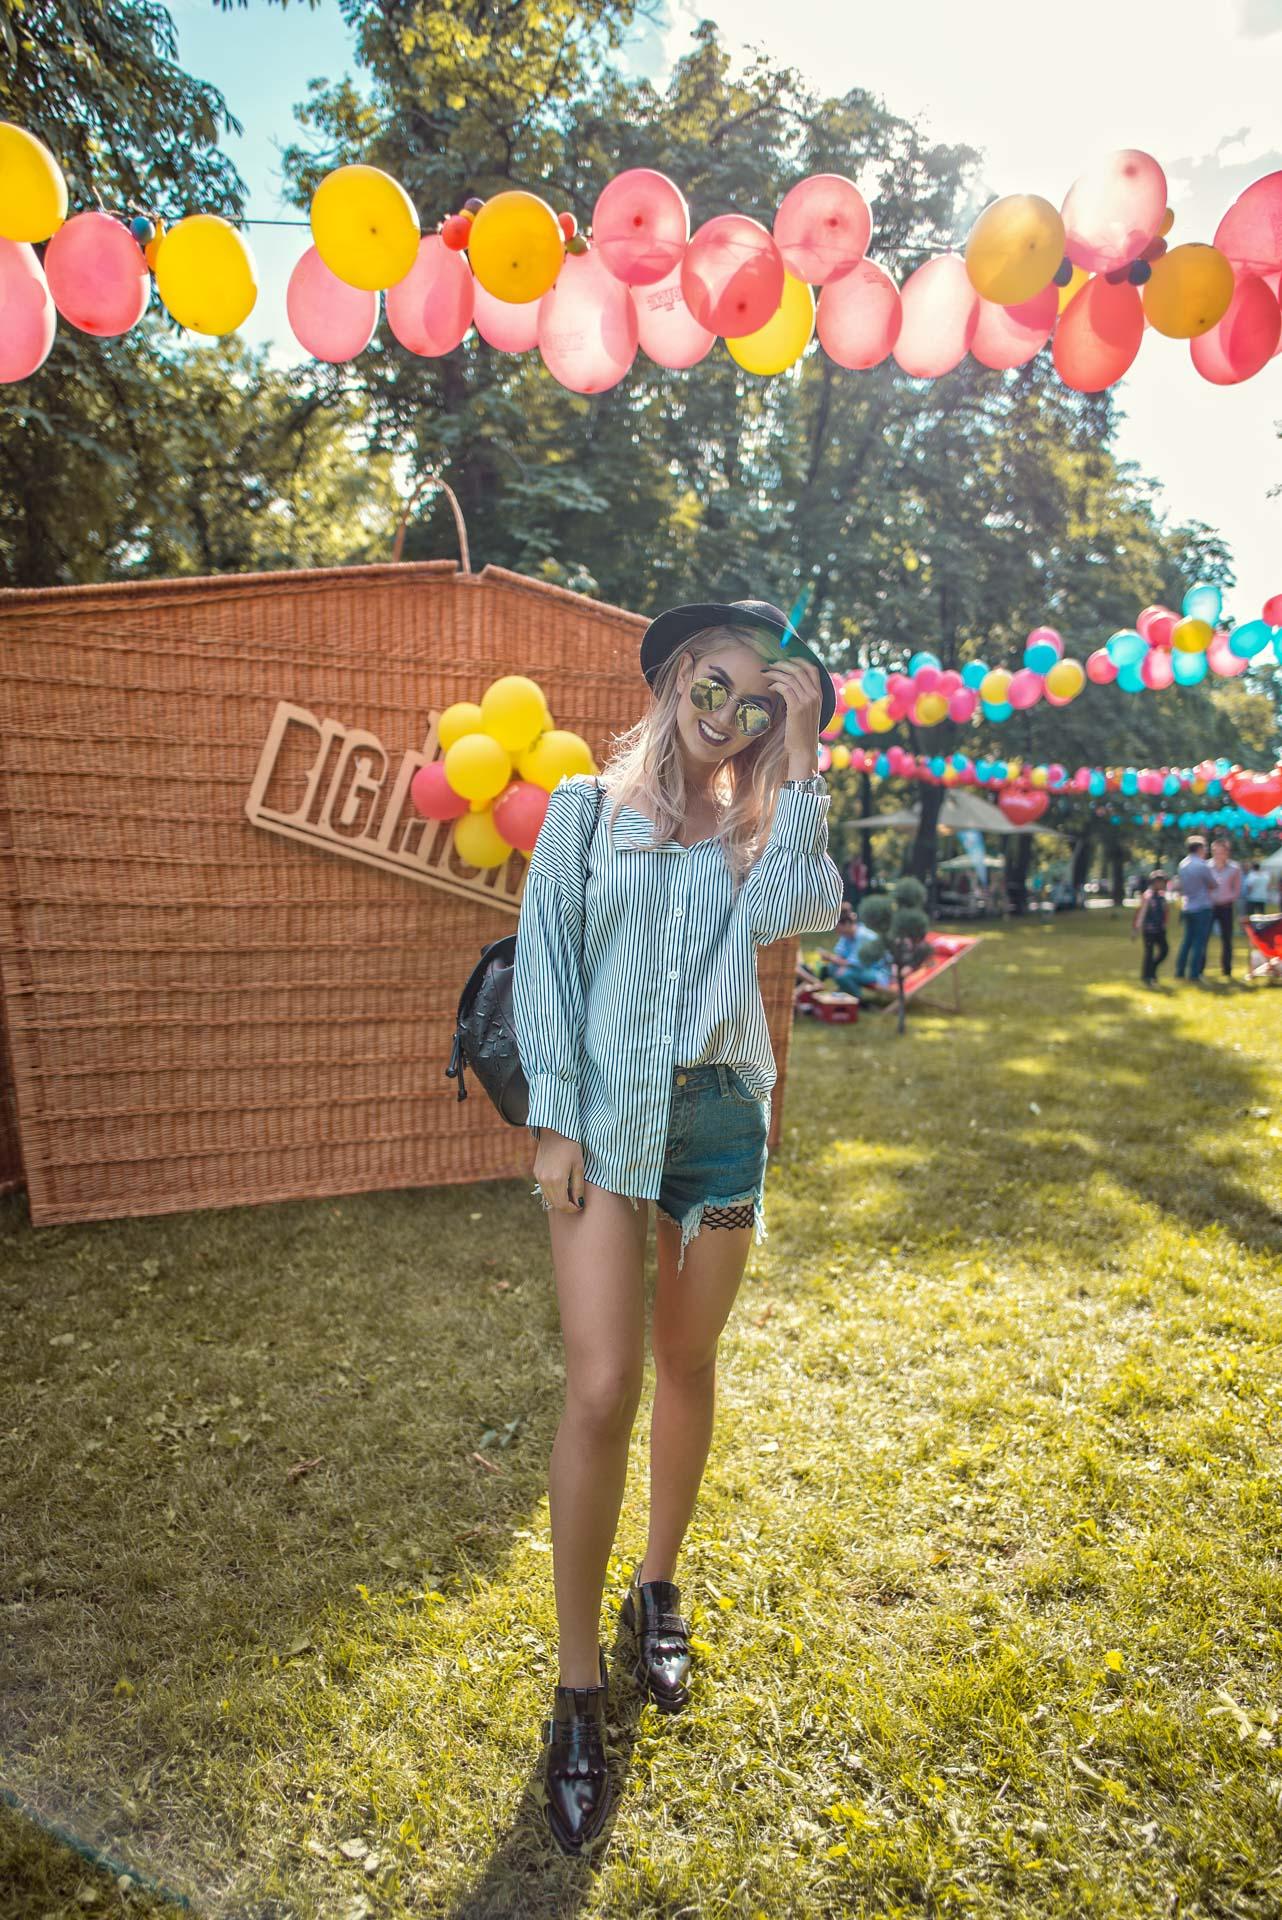 Festival vibes in Oradea